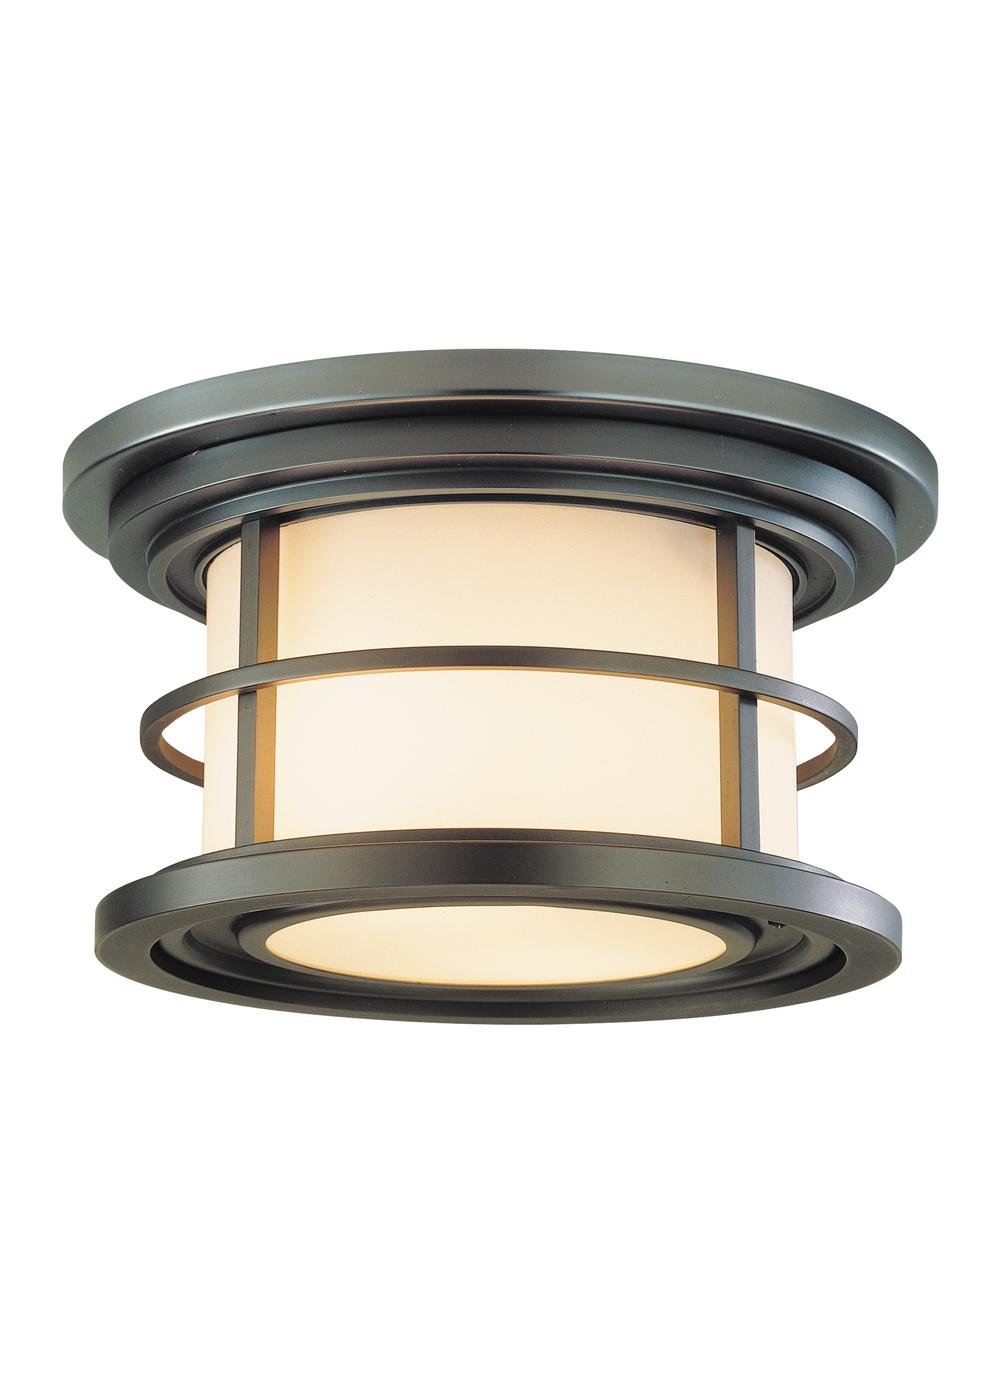 Generation Lighting - Two - Light Ceiling Fixture